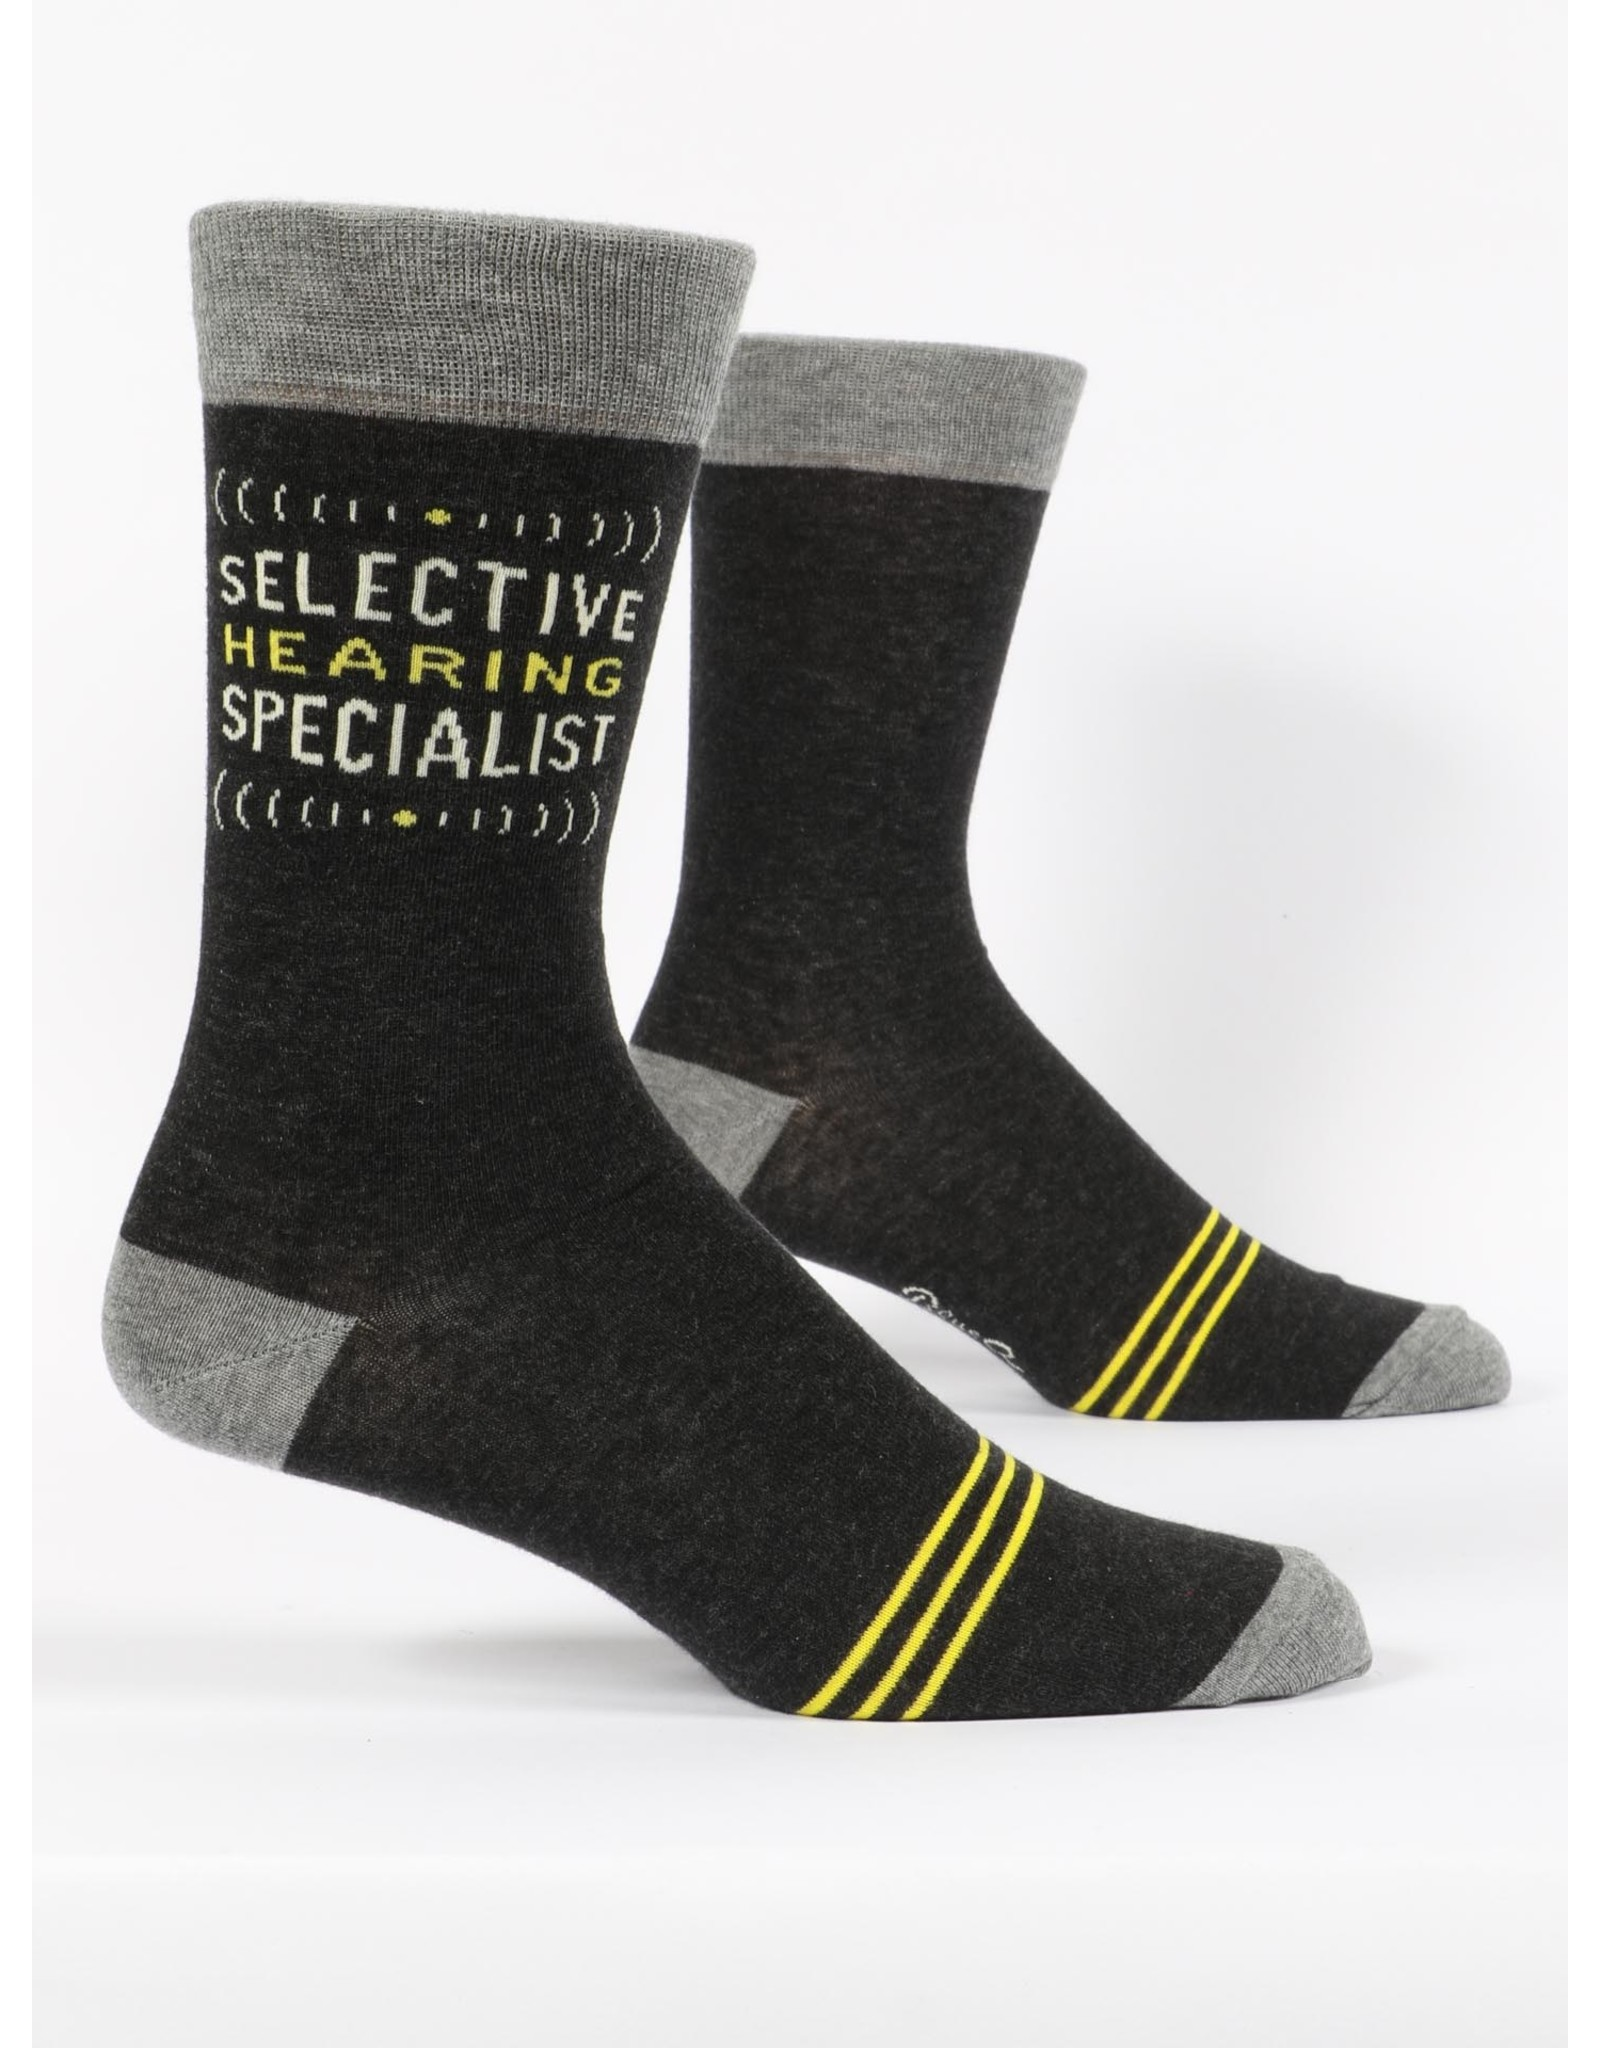 Blue Q - Men's Socks/Selective Hearing